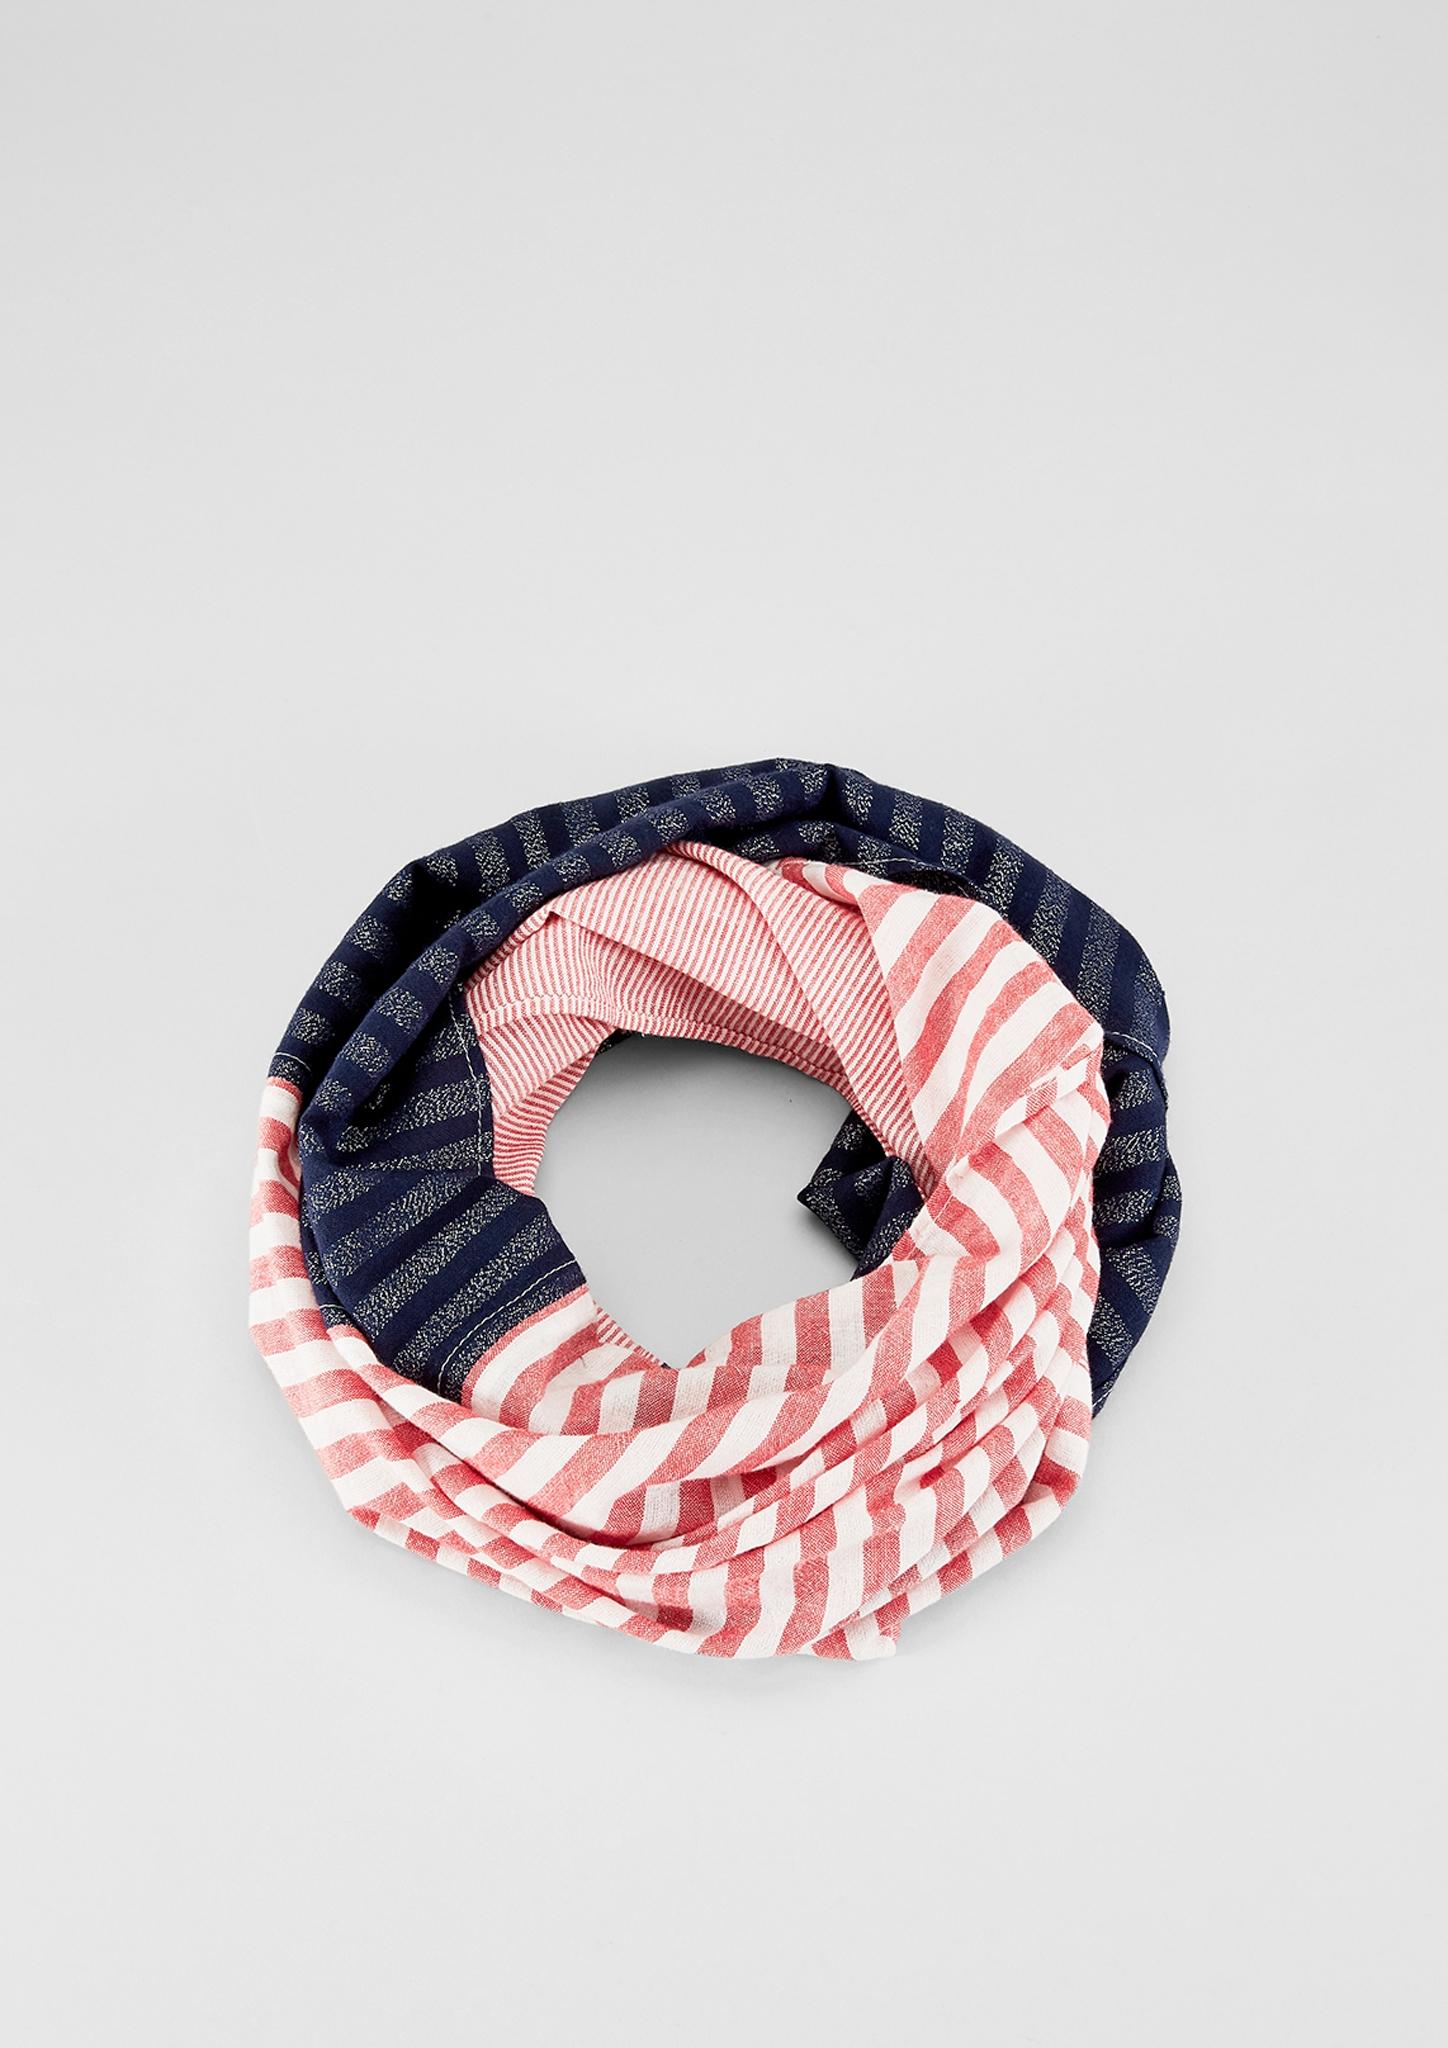 Loop | Accessoires > Schals & Tücher > Loops | Rot | Obermaterial a 76% viskose -  15% baumwolle -  9% metallisiertes garn| obermaterial b 100% baumwolle | s.Oliver